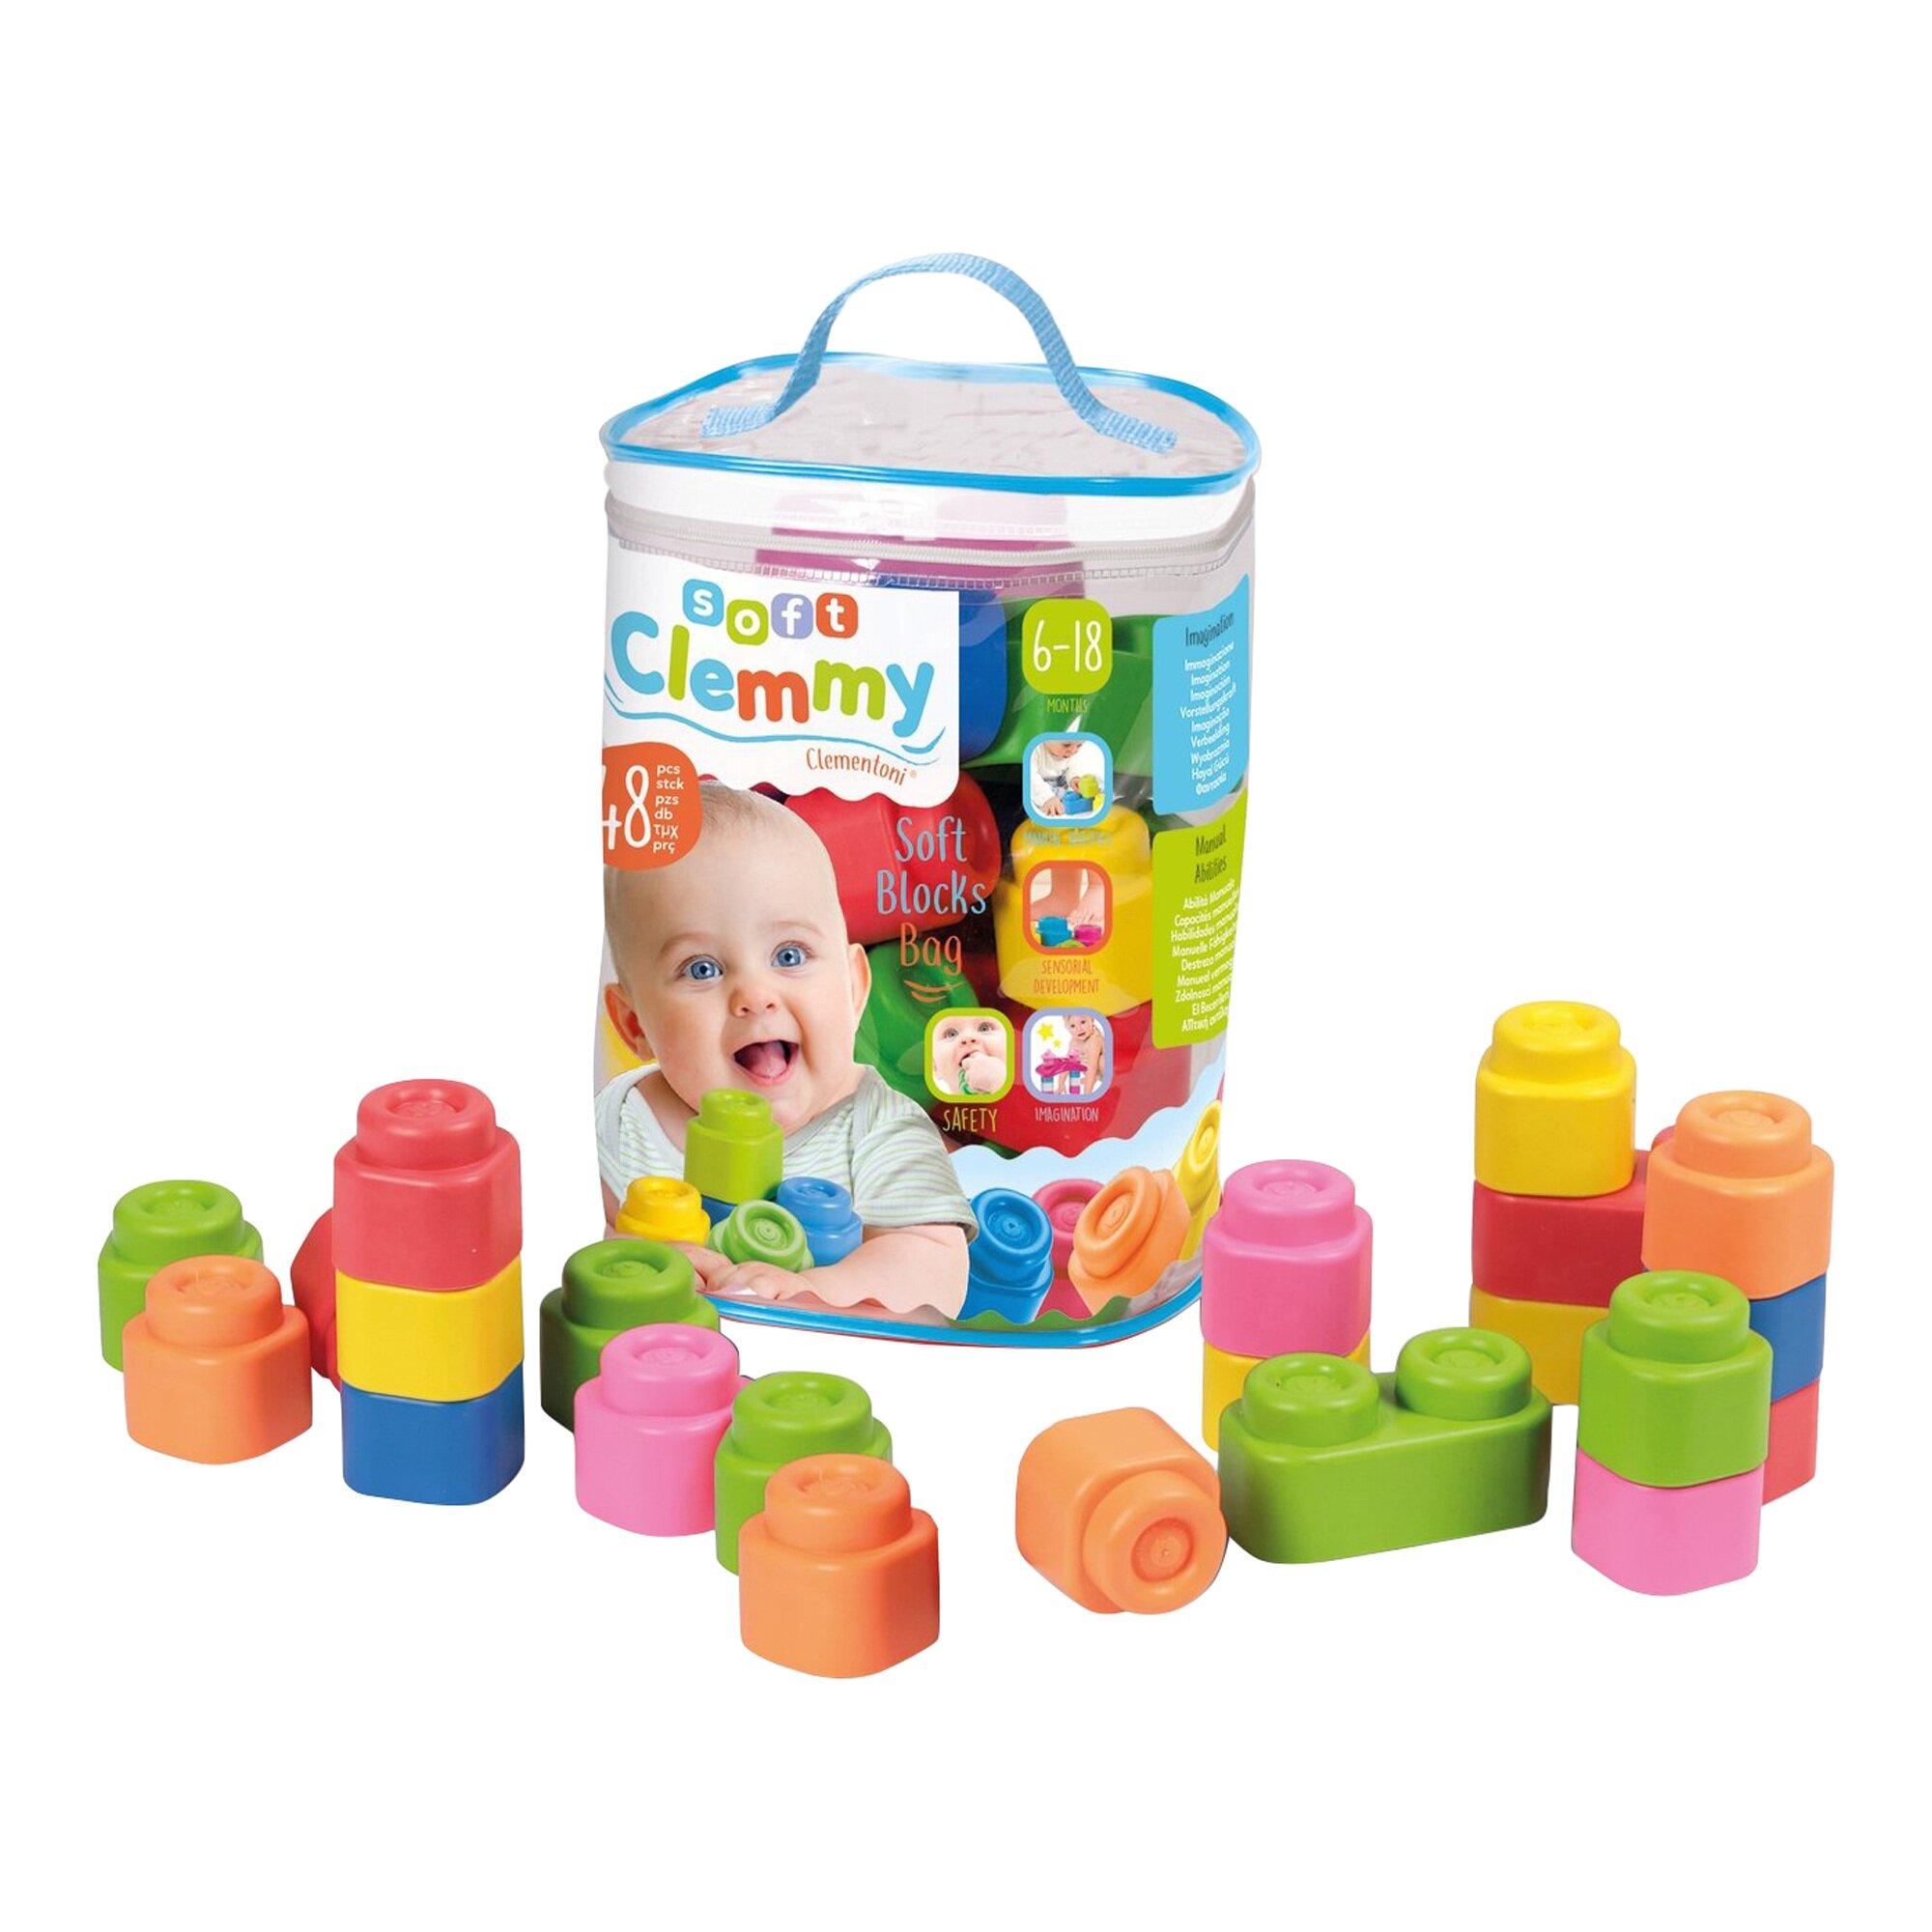 Baby Clemmy Softbausteine im Beutel 48 Stück